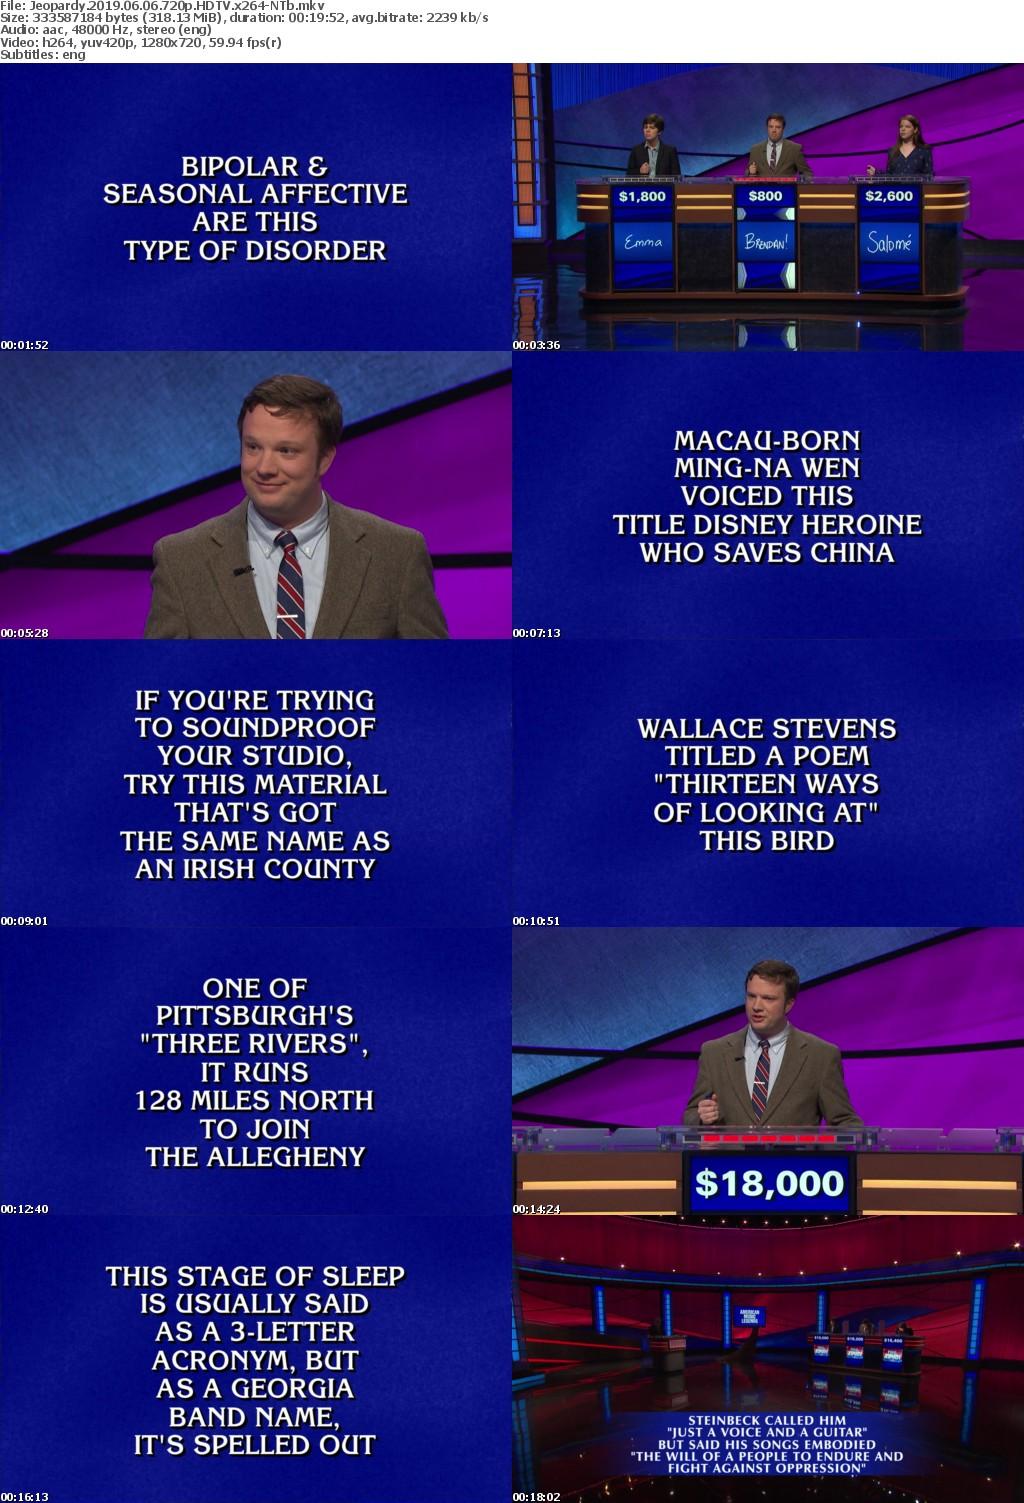 Jeopardy 2019 06 06 720p HDTV x264-NTb